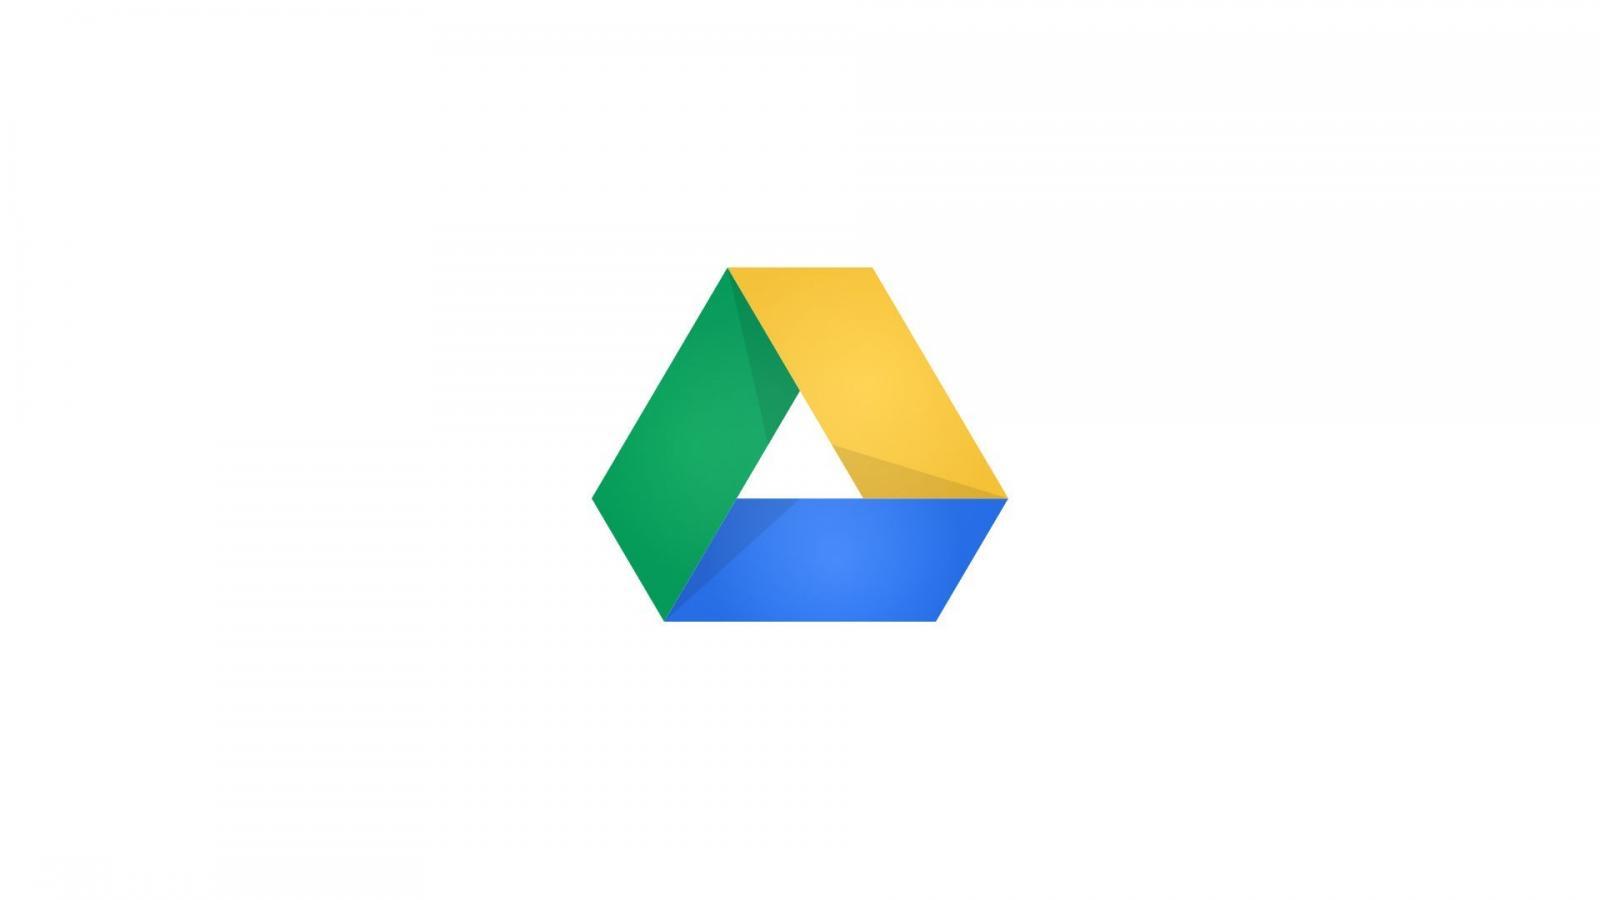 Cia google nwo drive minimalistic wallpaper 106183 1600x900